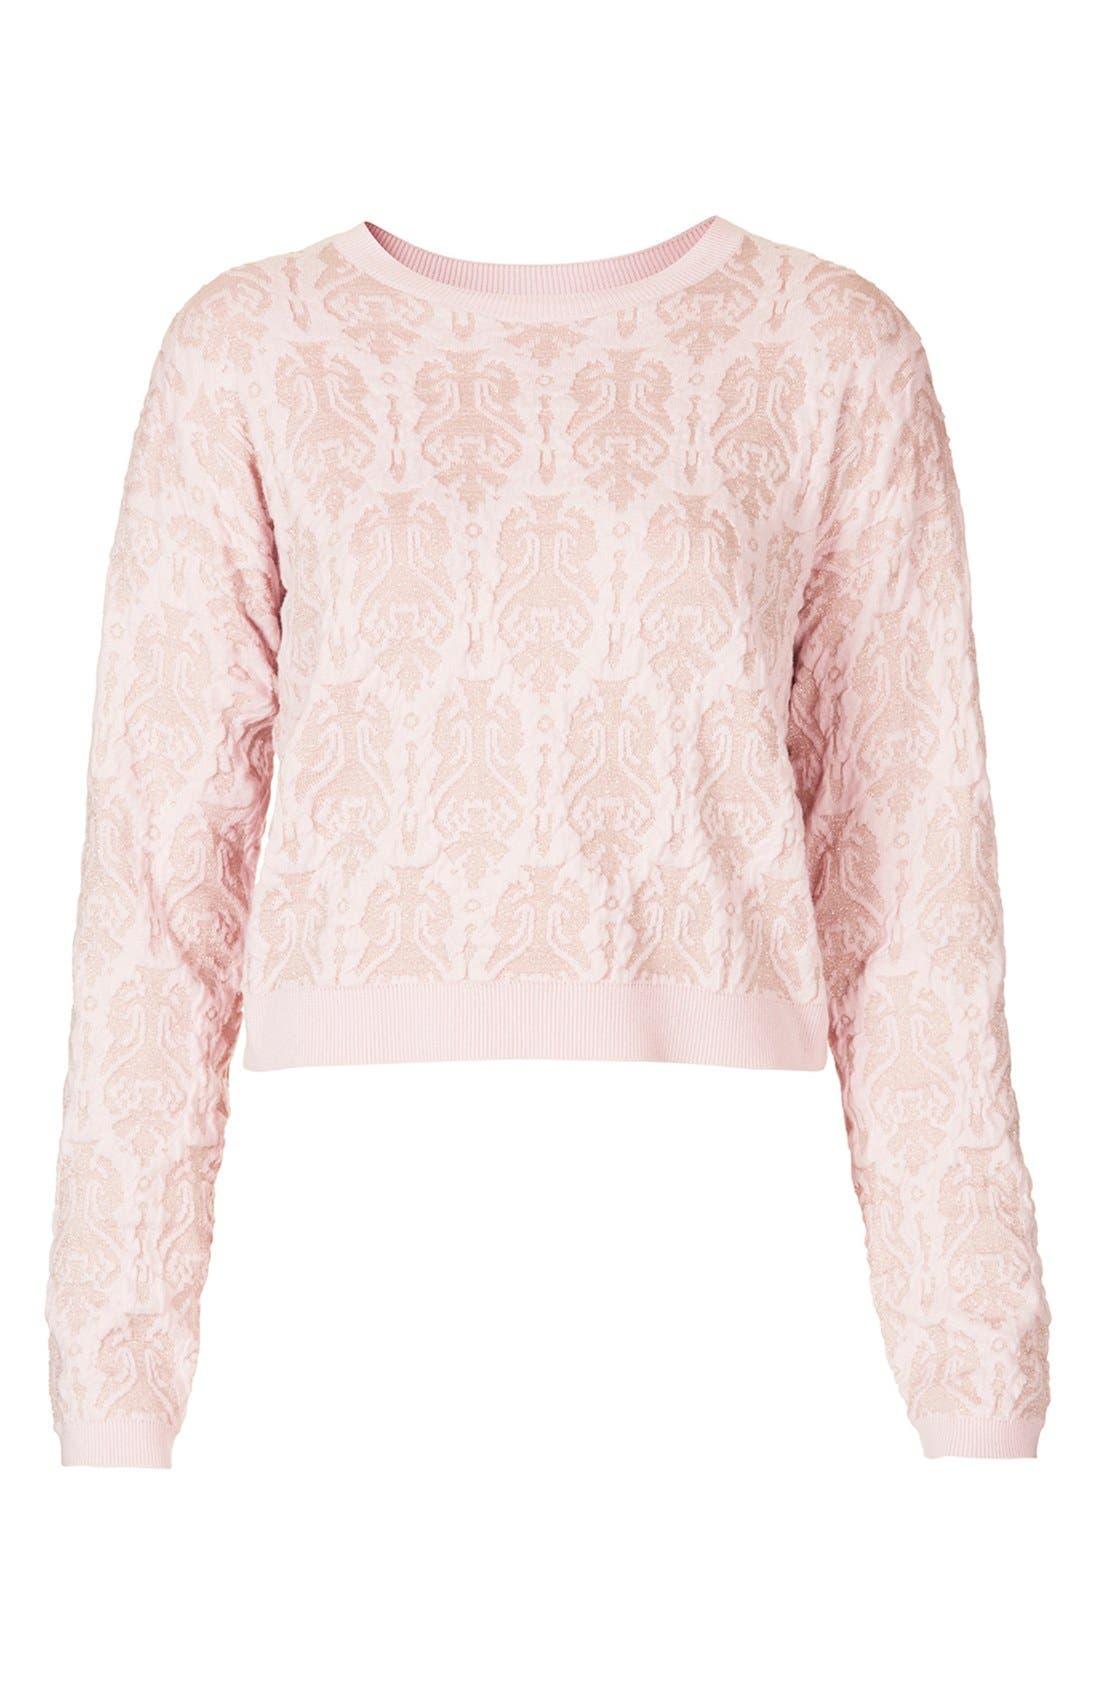 Alternate Image 3  - Topshop '3D Baroque' Metallic Quilted Sweater